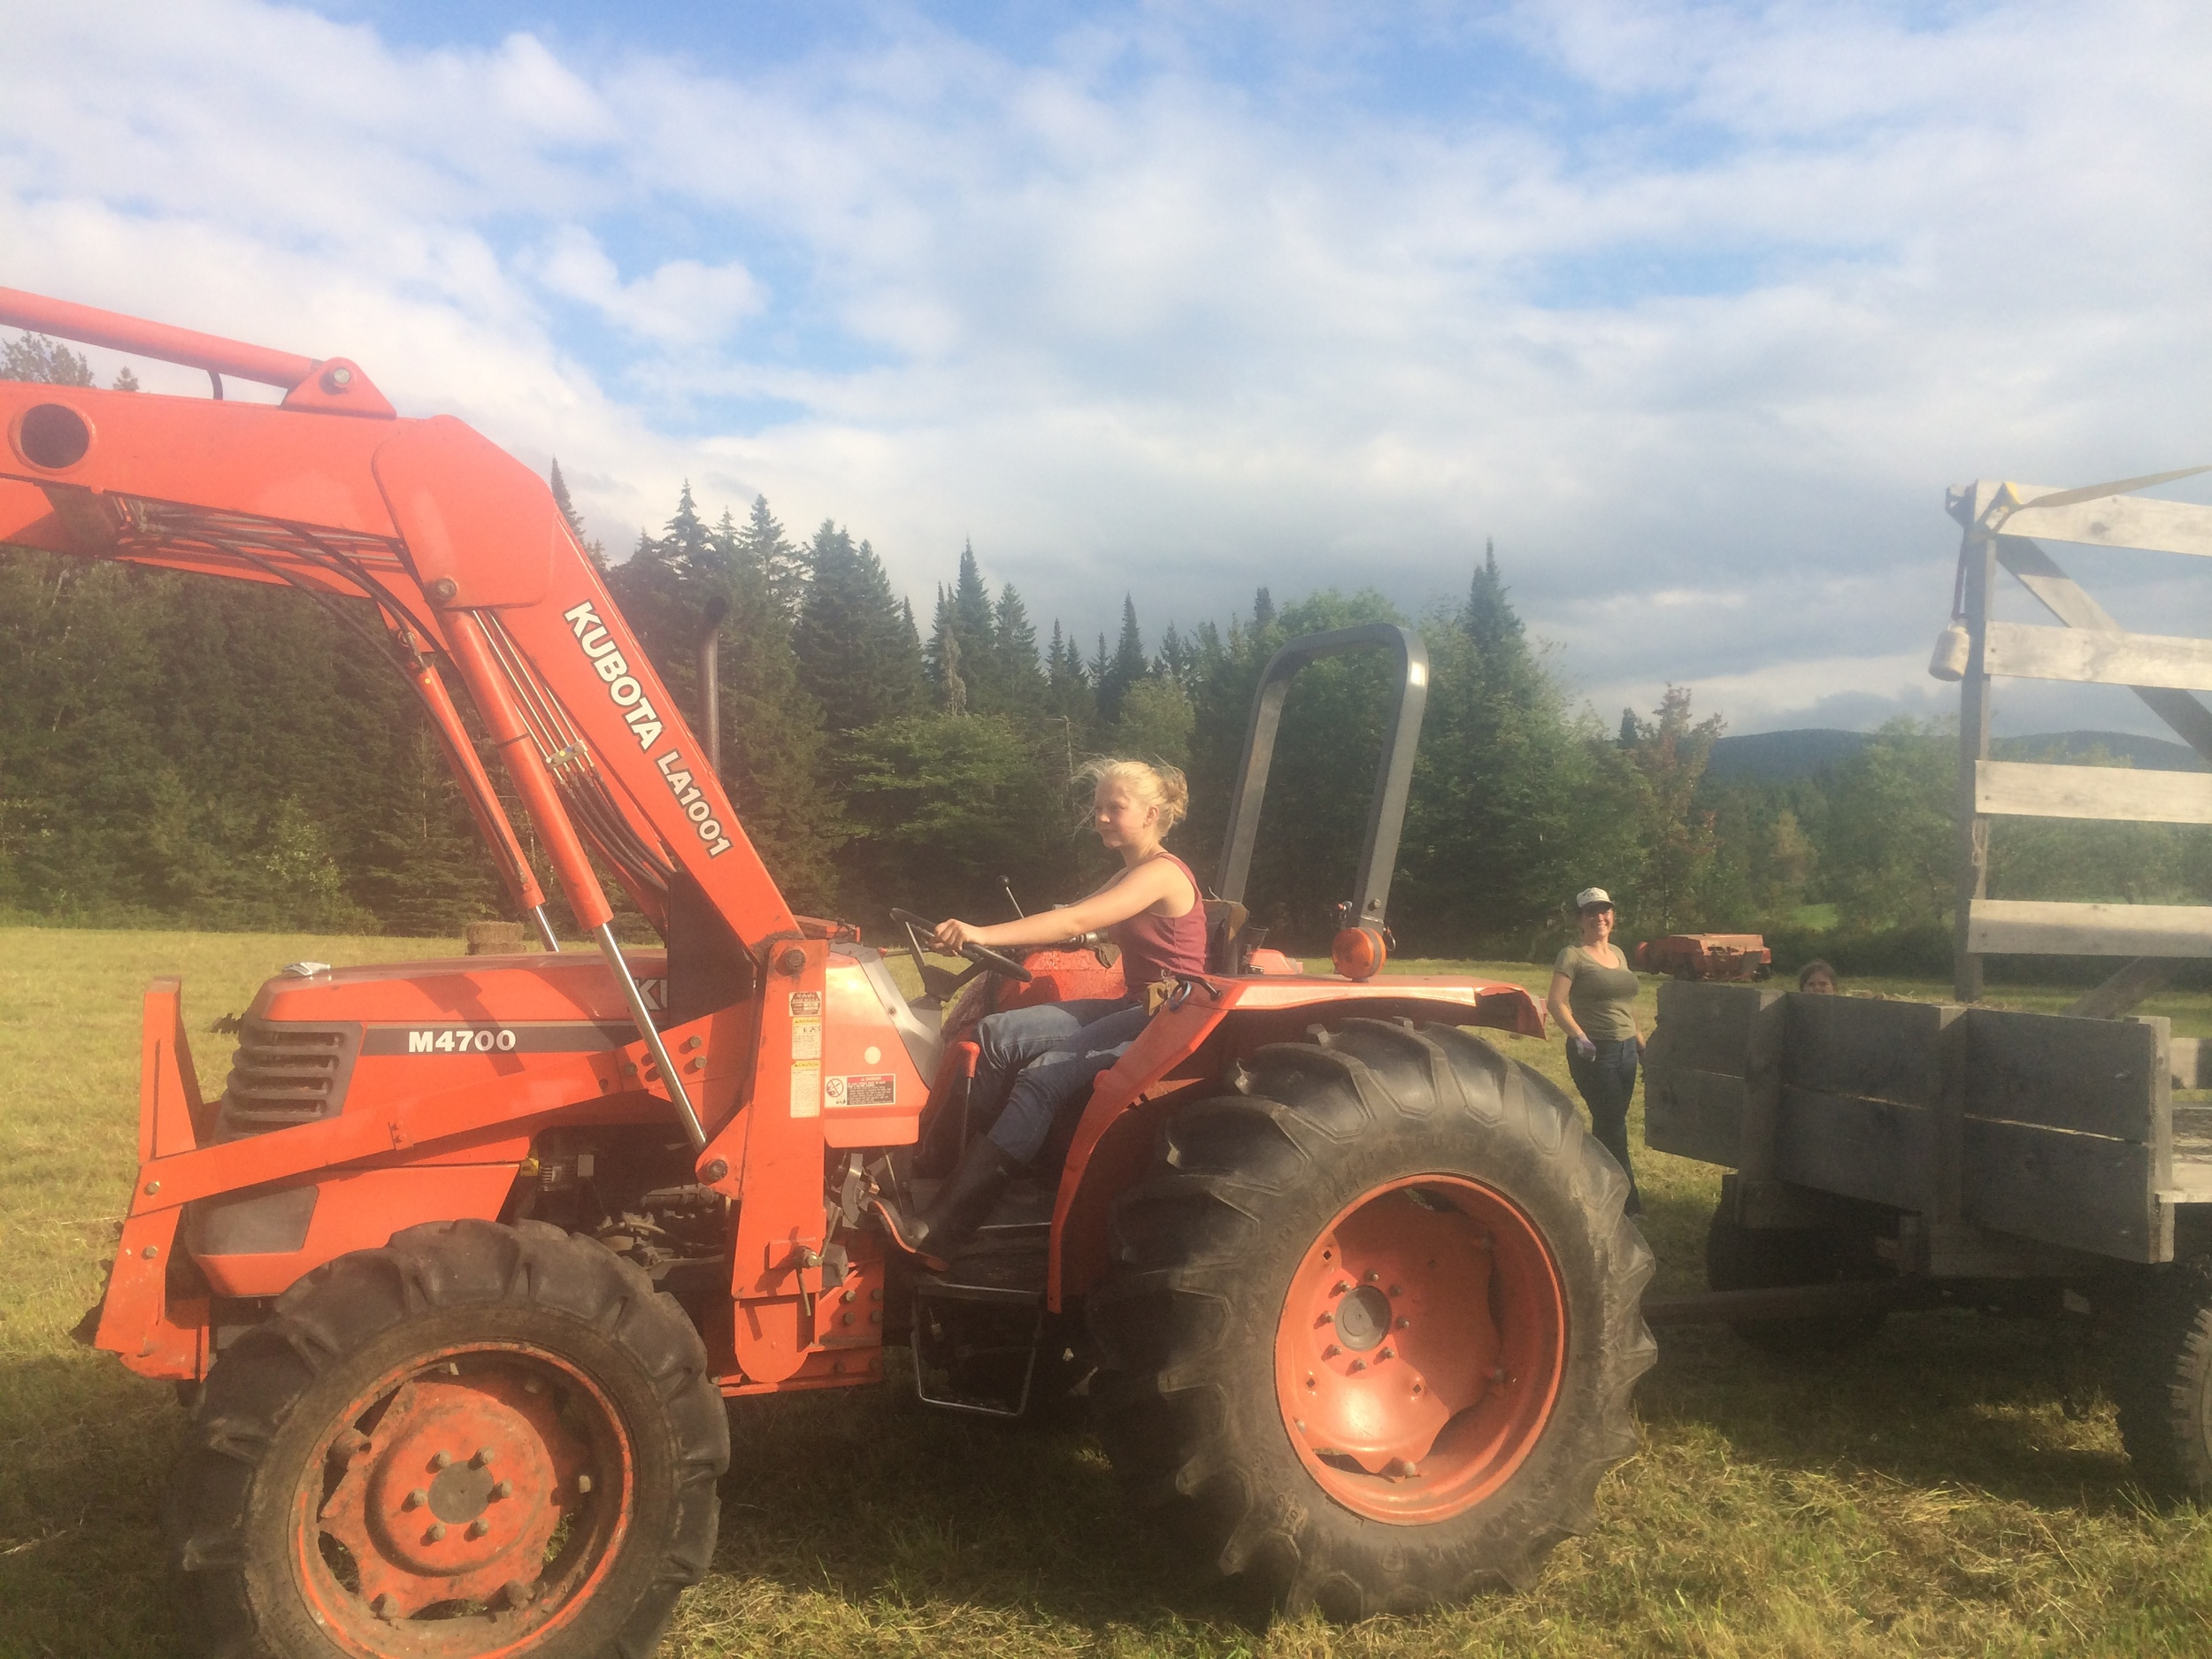 kai driving the hay wagon